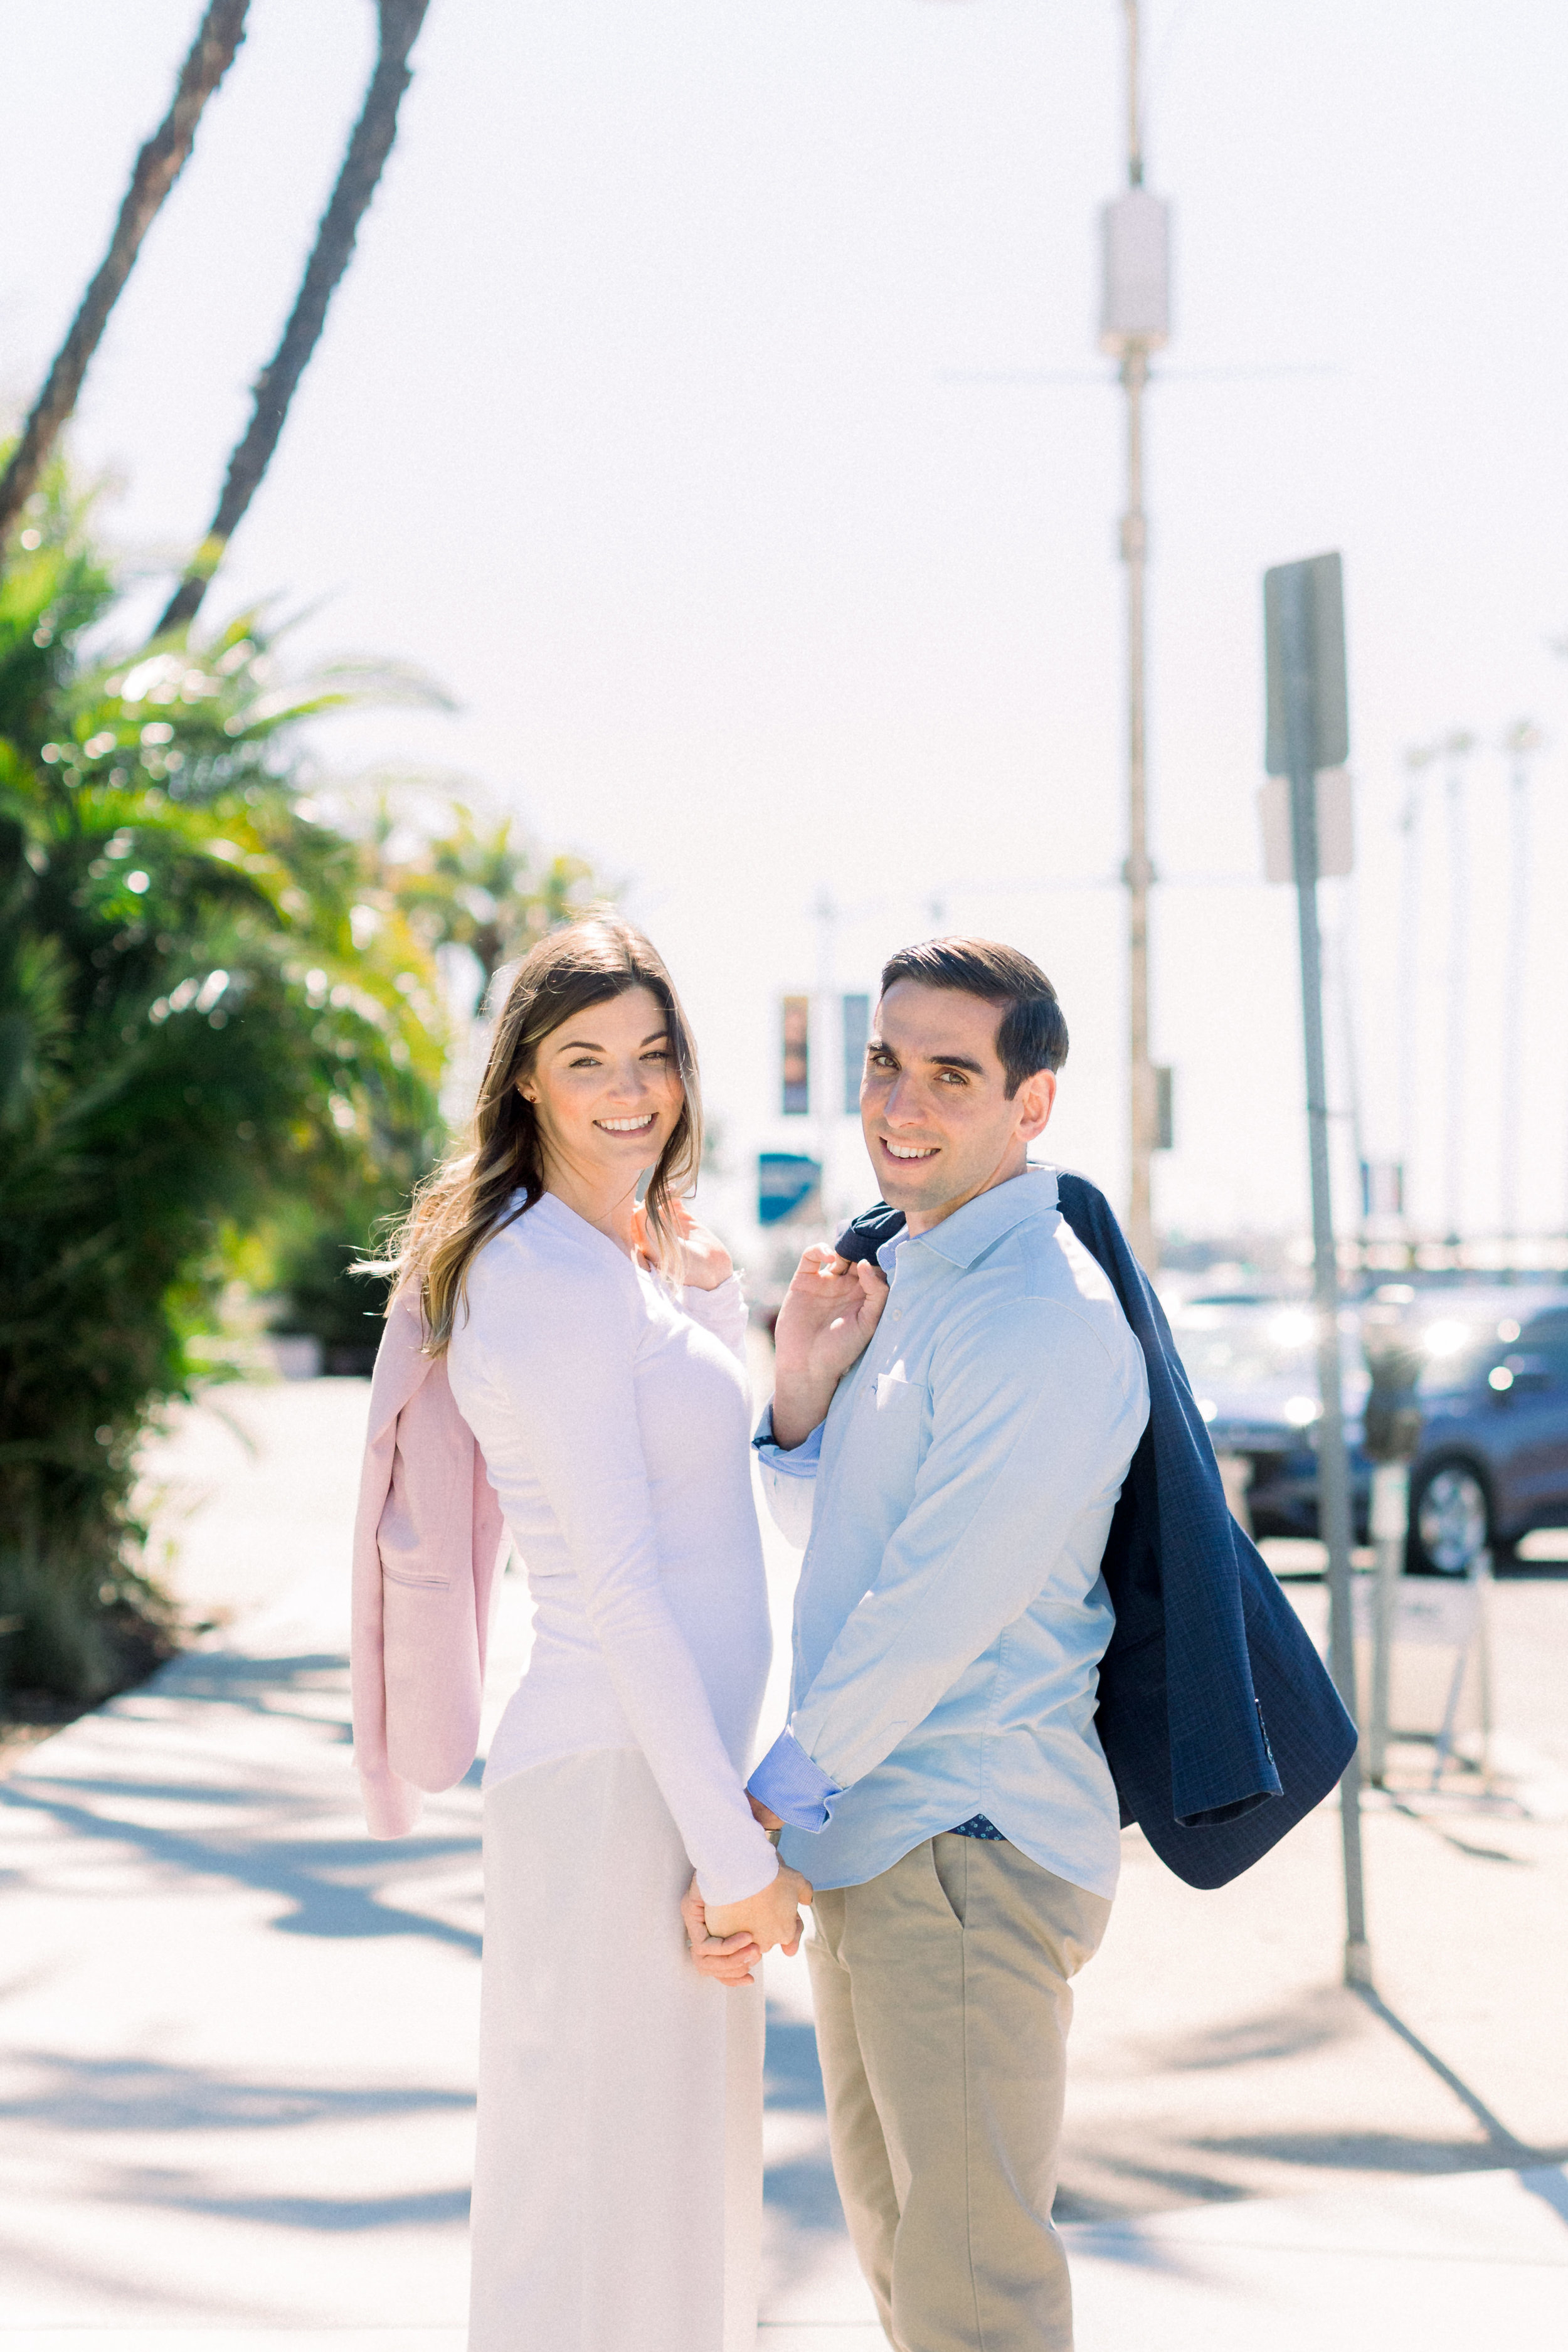 Claire_and_Dan_San_Diego_Administration_Building_Elopement_Alyssa_Boynton_Photography-31.jpg